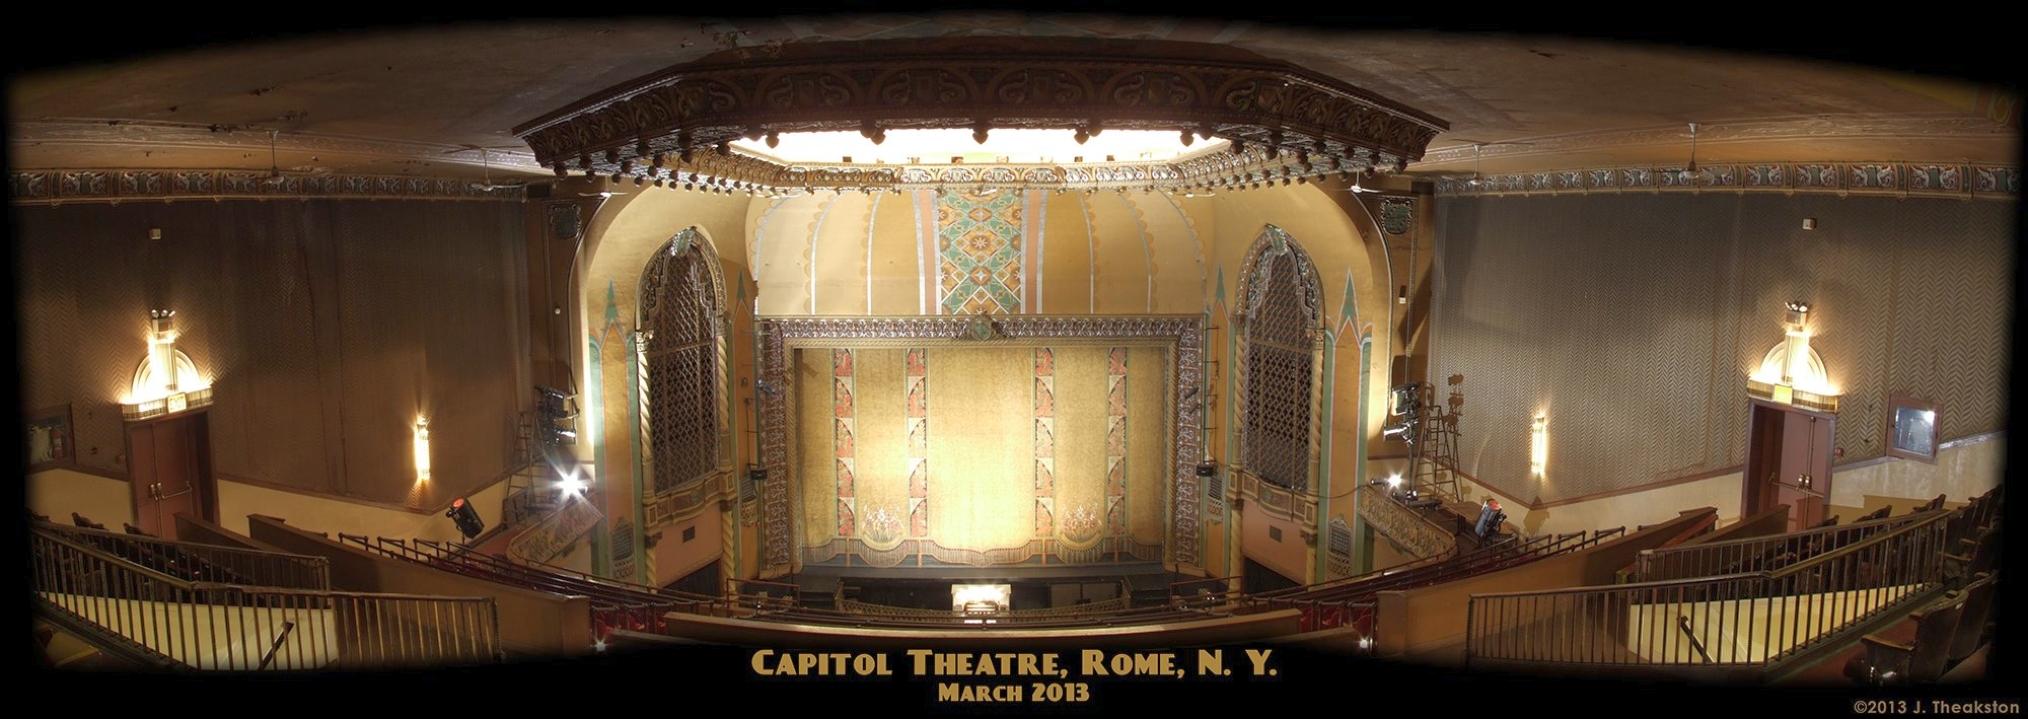 capitol theatre rome ny 00a